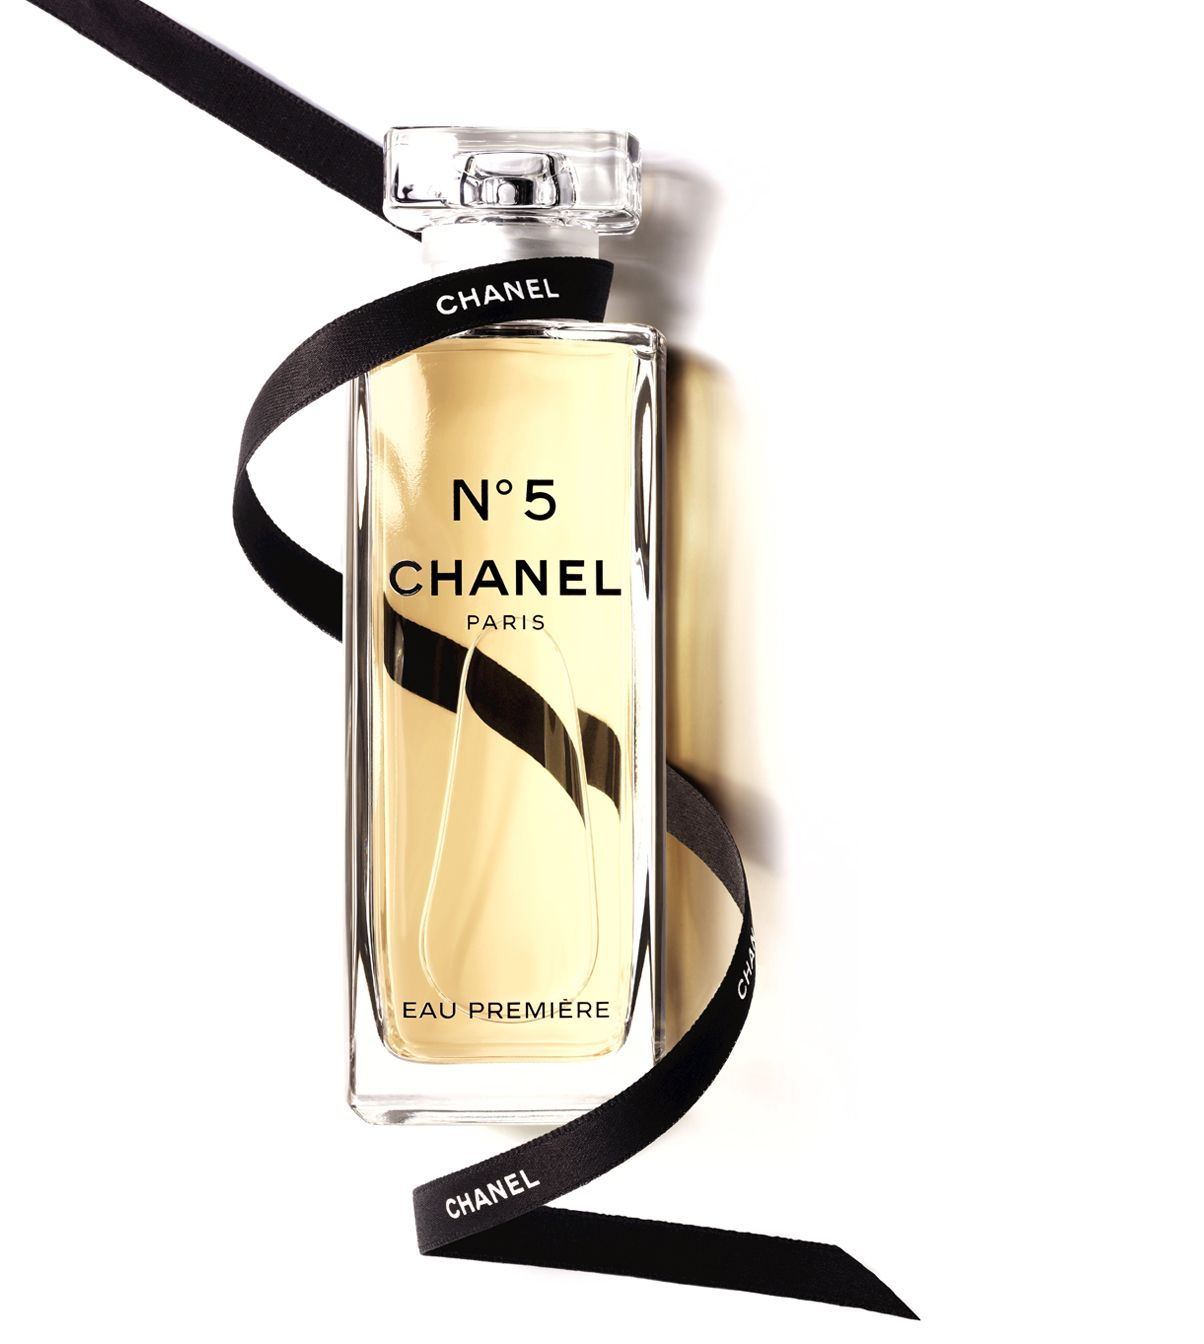 I Love This Chanel Perfume Chanel Fragrance Perfume